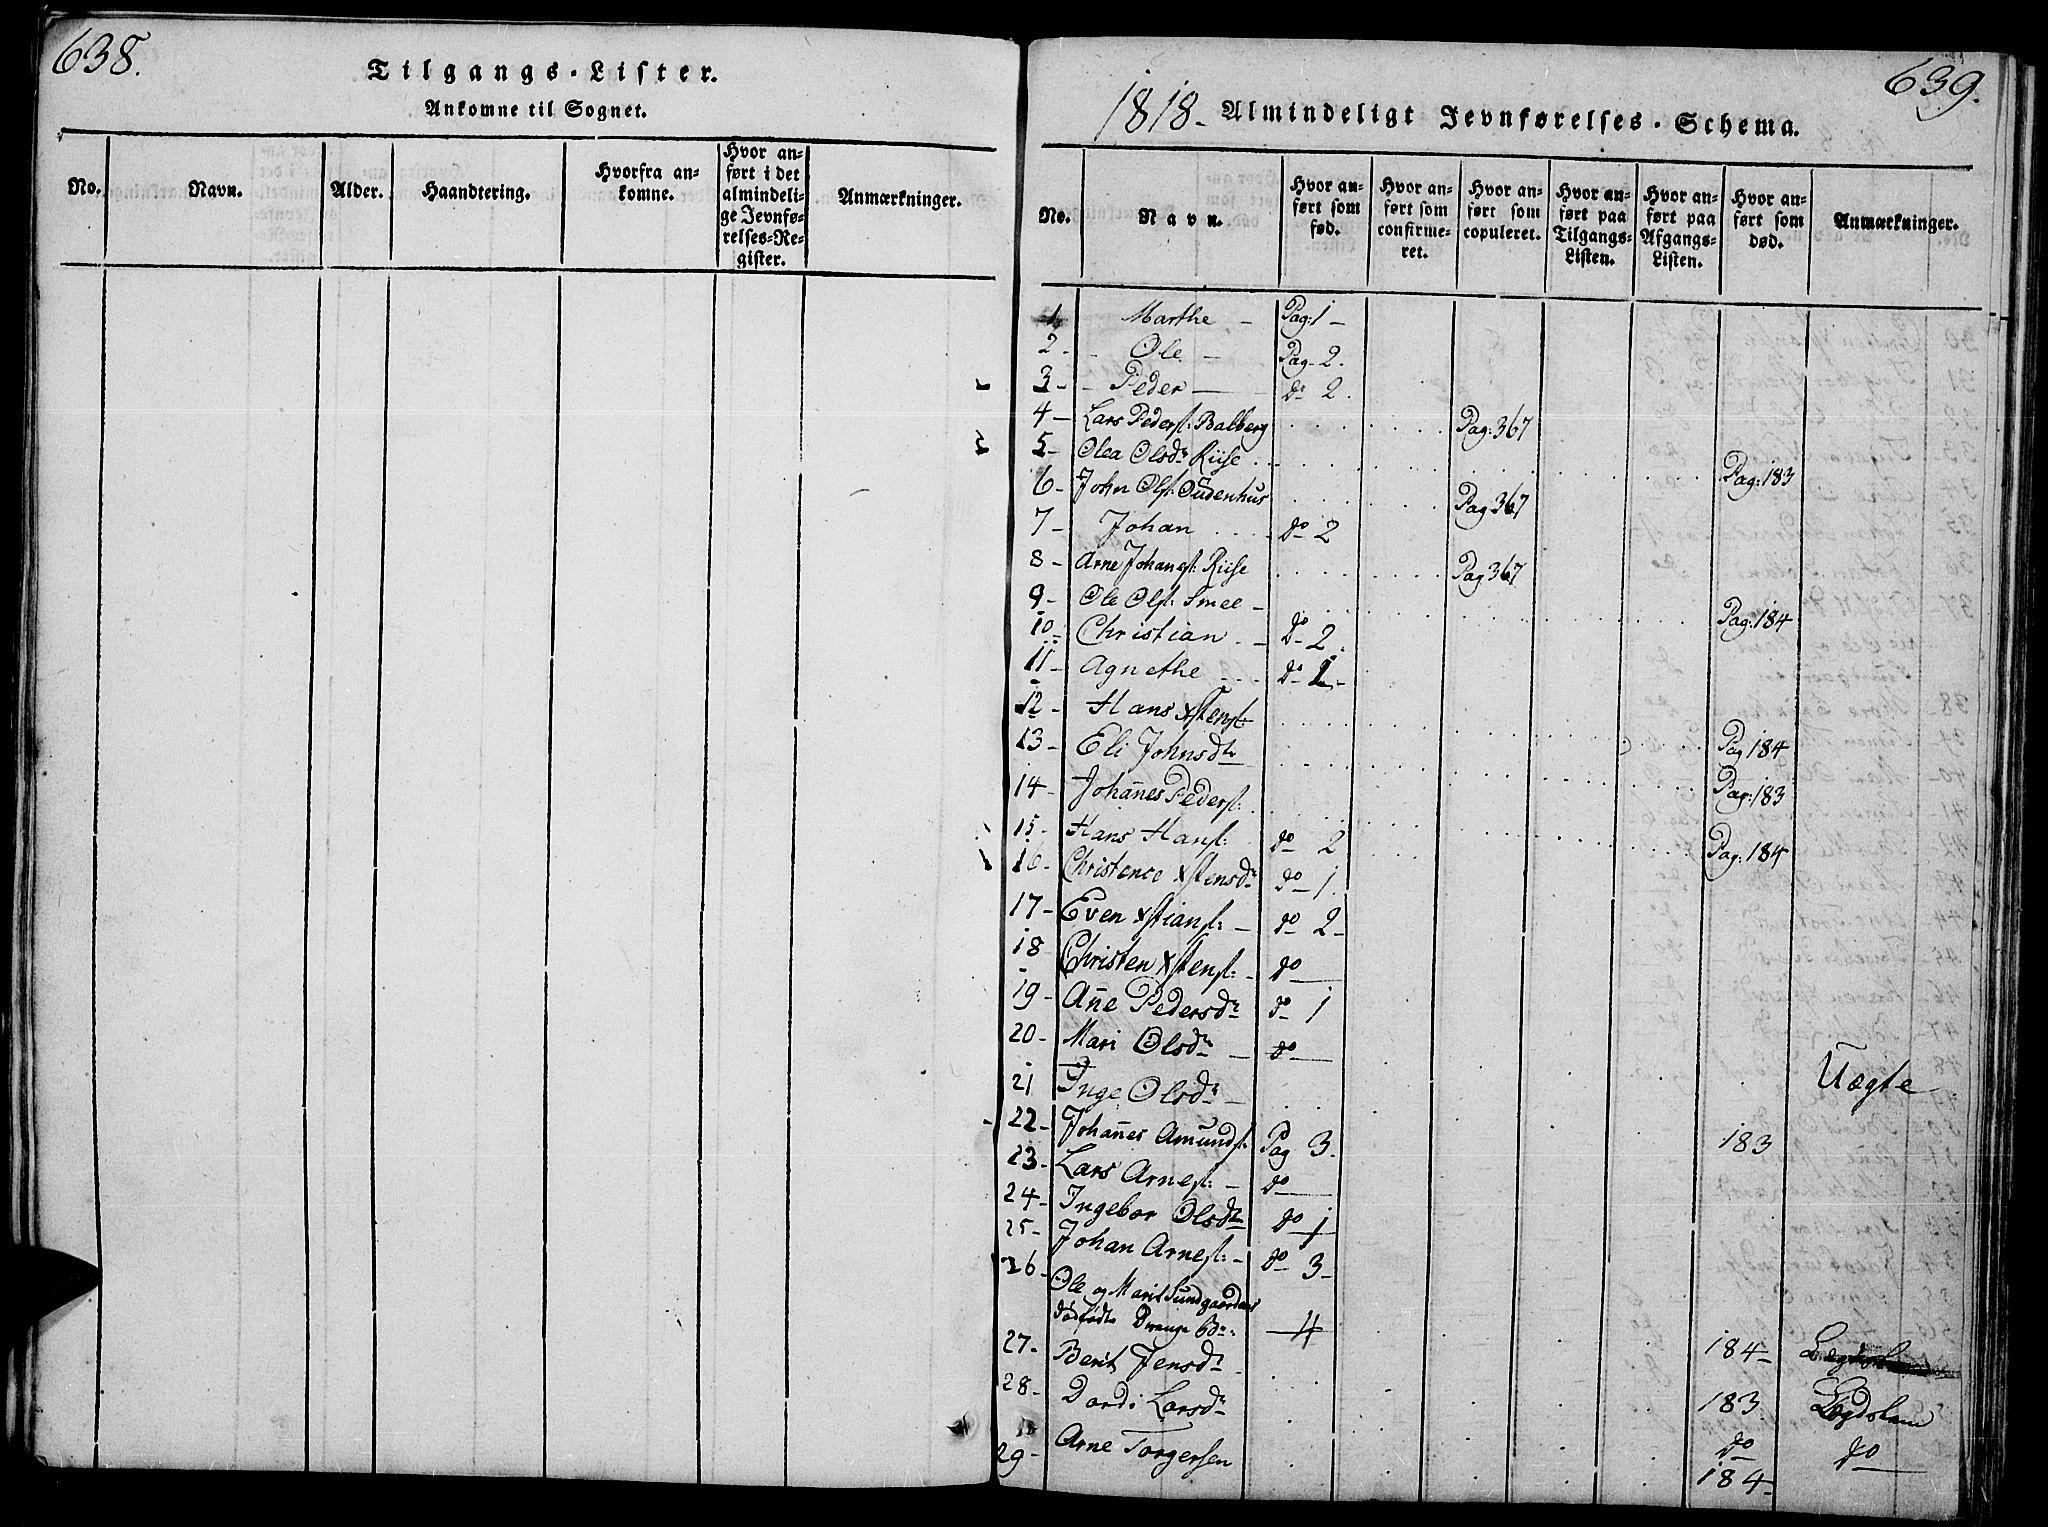 SAH, Fåberg prestekontor, Klokkerbok nr. 4, 1818-1837, s. 638-639